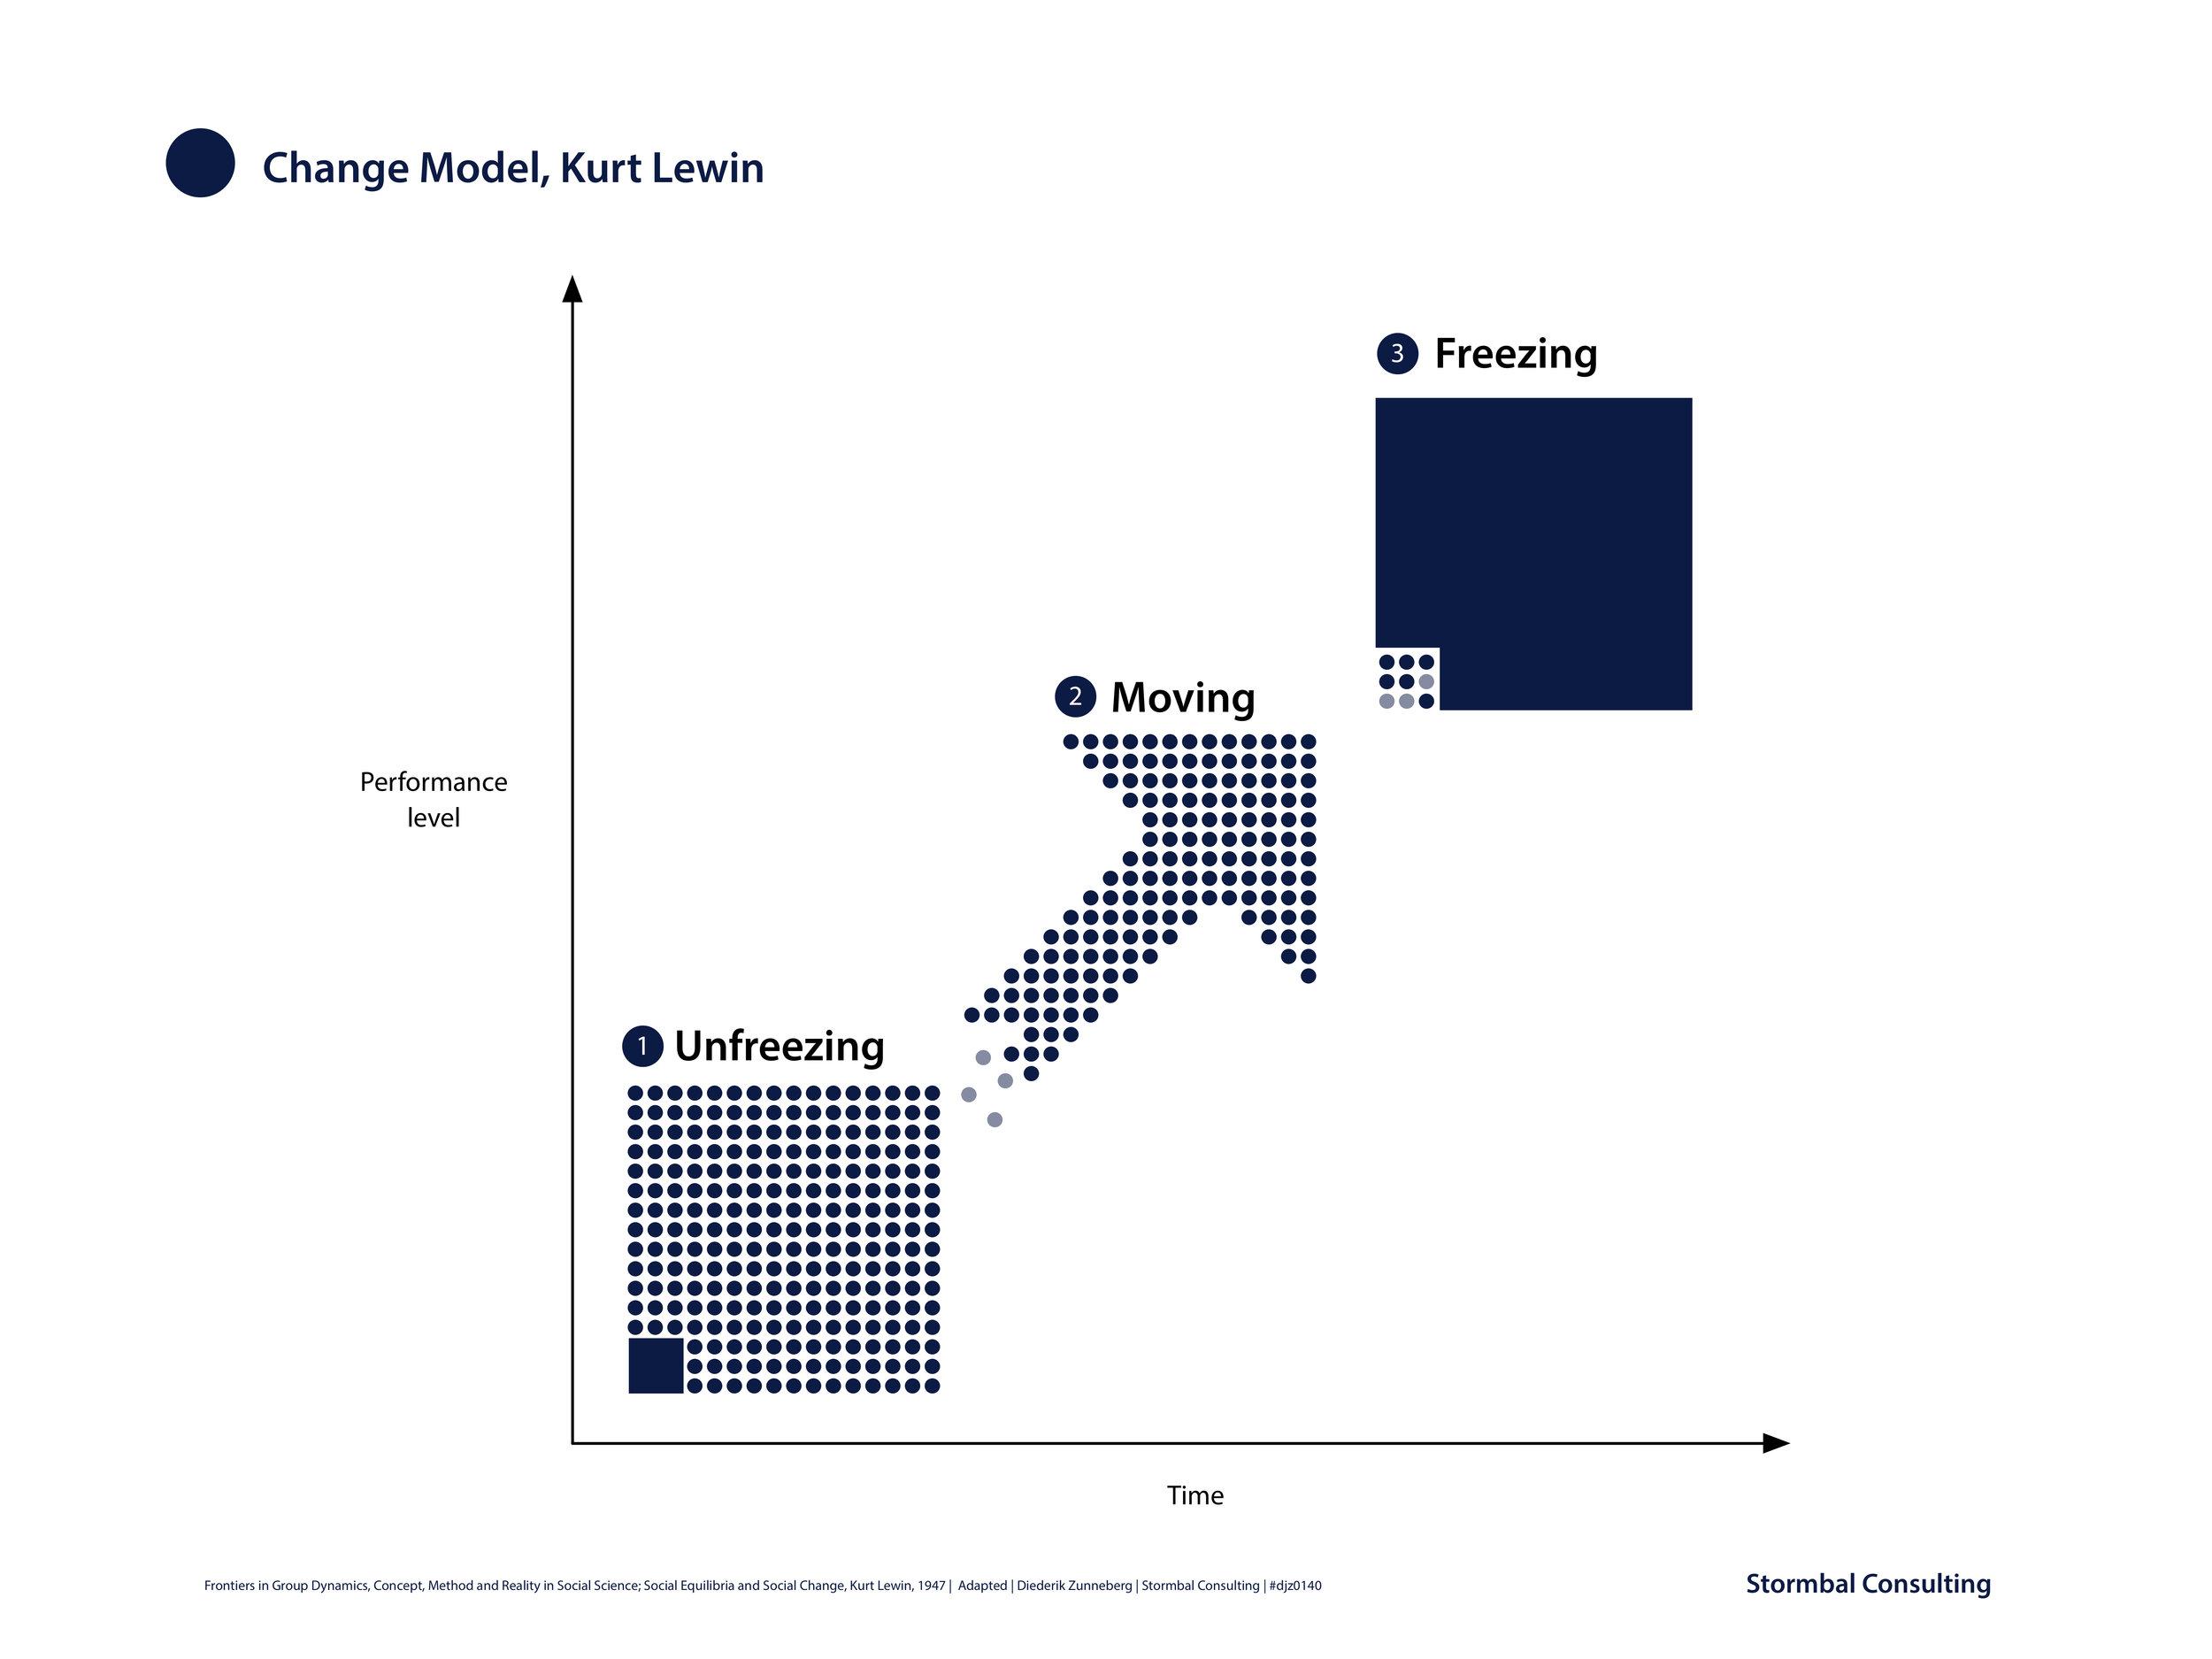 Kurt-Lewin-Change-Model-Unfreezing-Moving-Freezing-Diederik-Zunneberg-Stormbal-Consulting-djz0140c.jpg